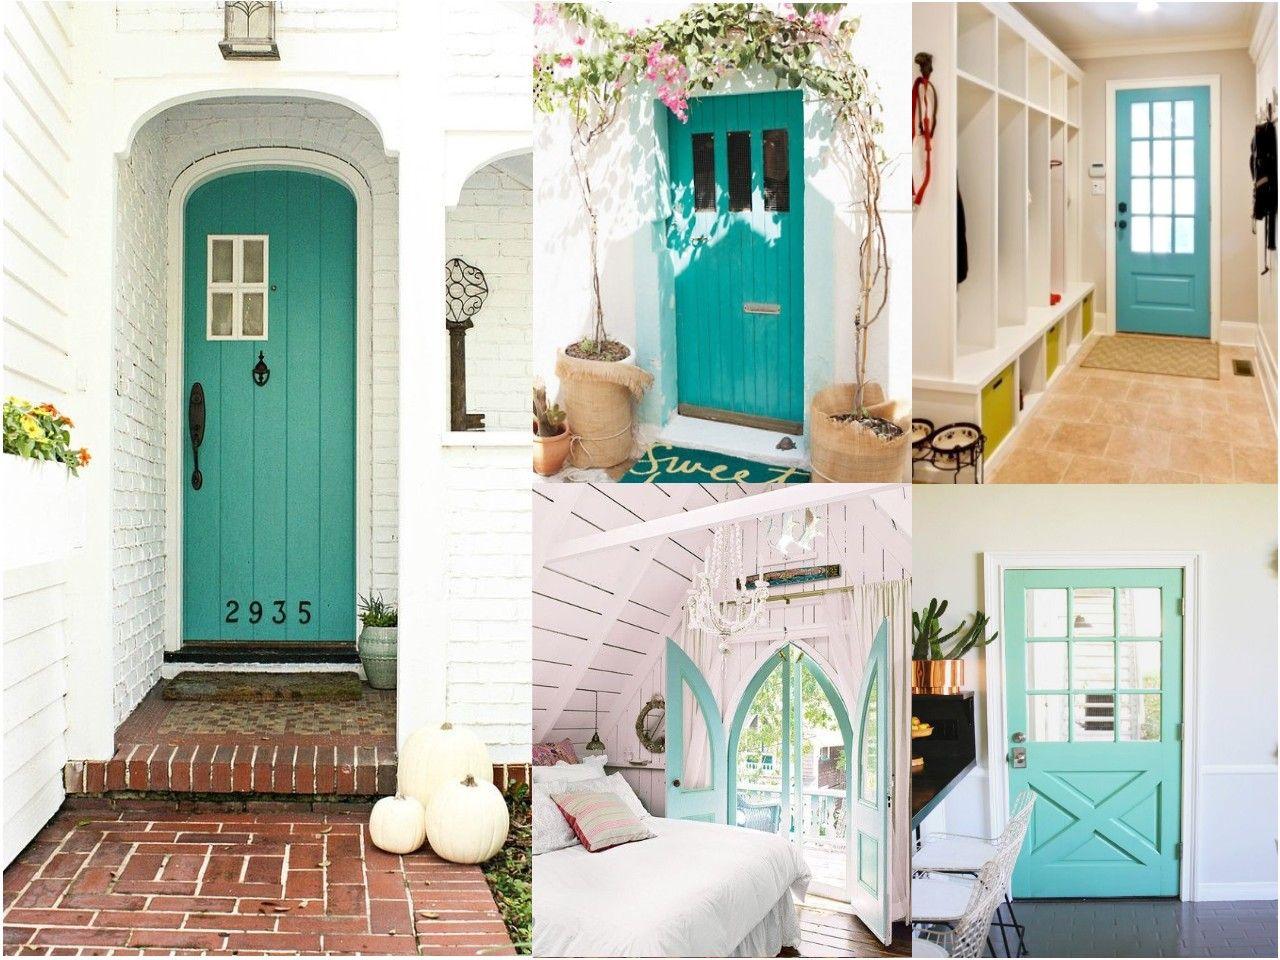 C mo pintar las puertas de casa ideas e inspiraci n ideas decoraci n doors exterior y - Pintar puertas de casa ...